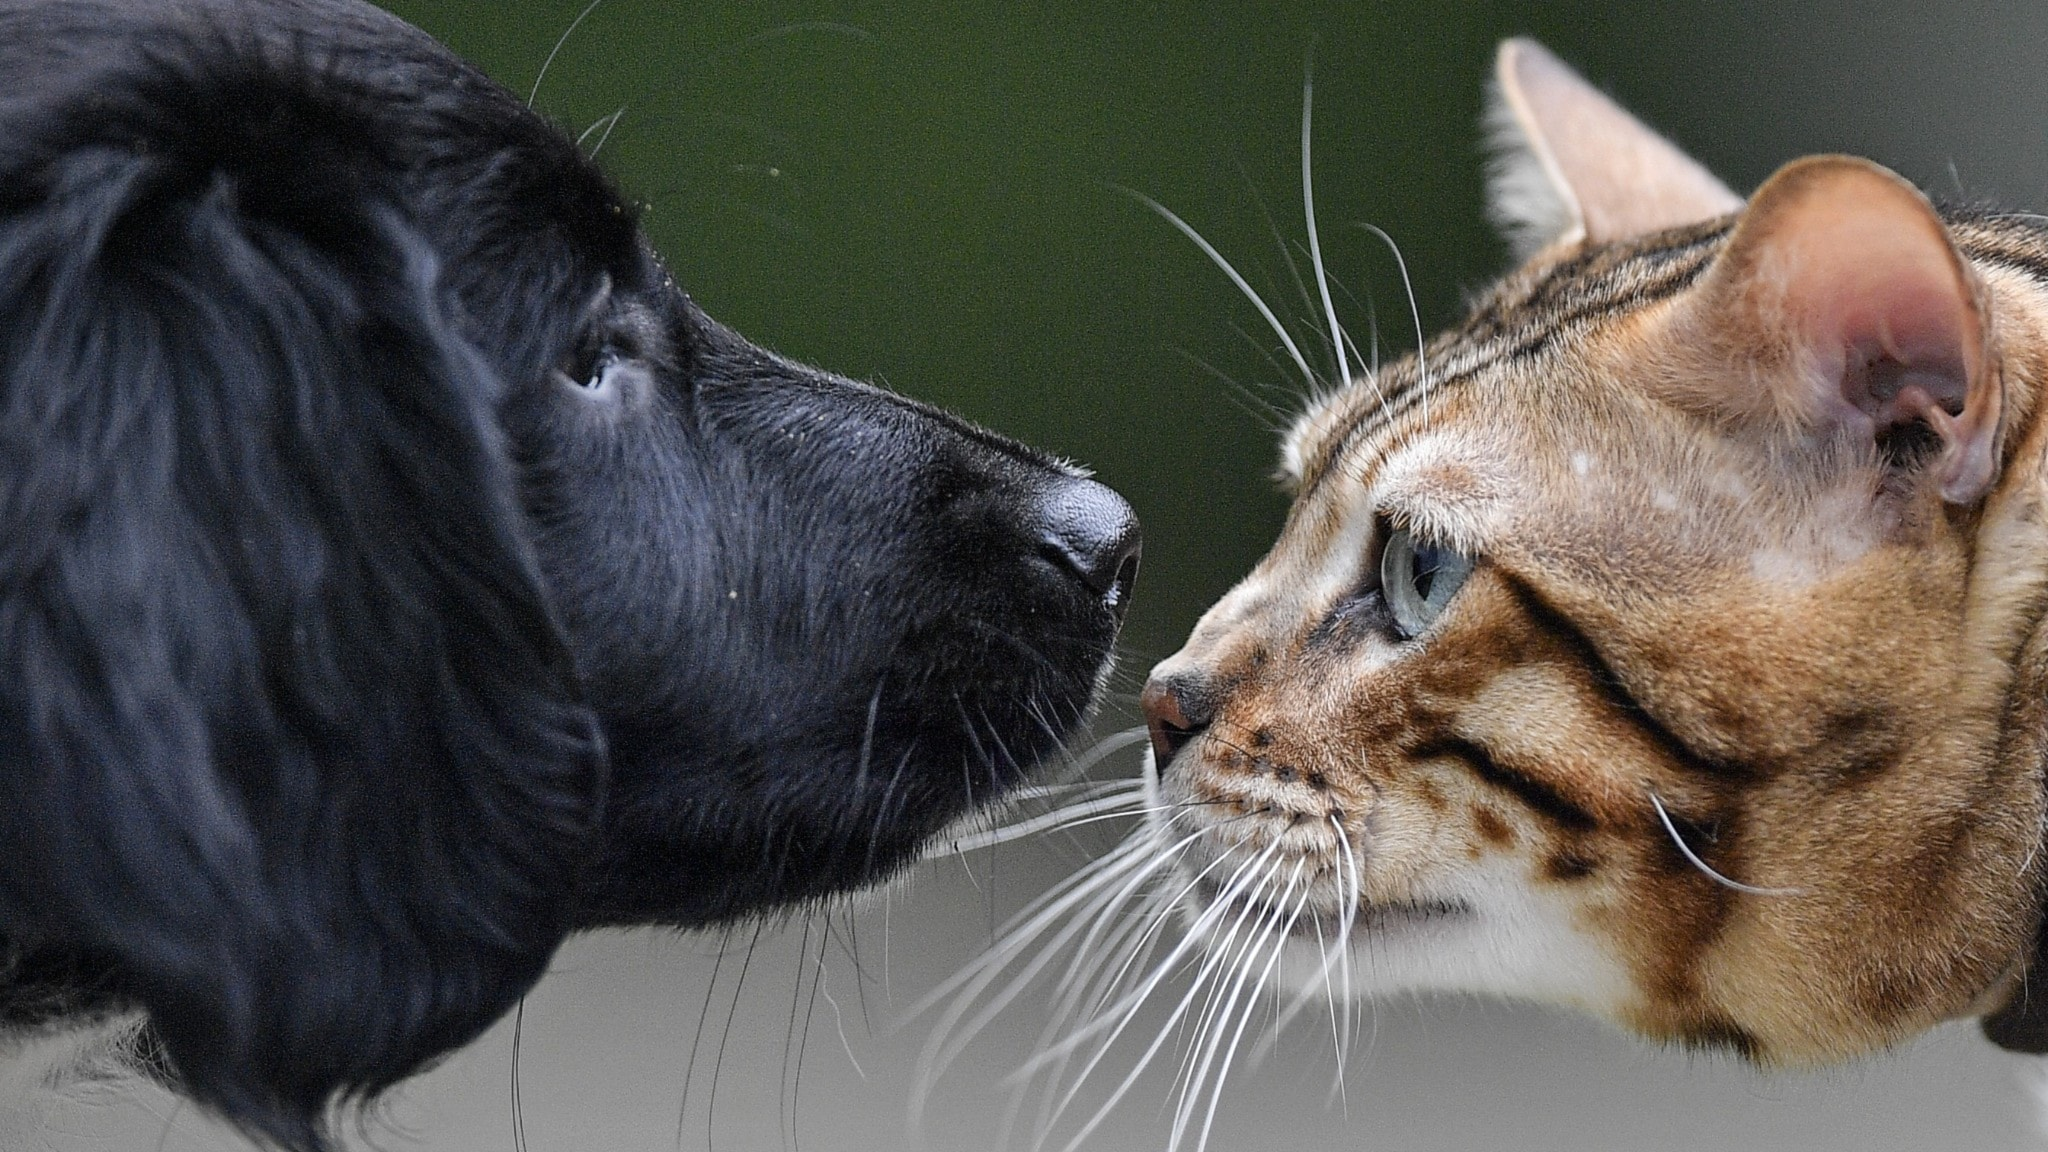 Stigande djurvårdspriser, Greta Thunbergs klimataktion i New York, Alexandra Zazzi tipsar om paprikor